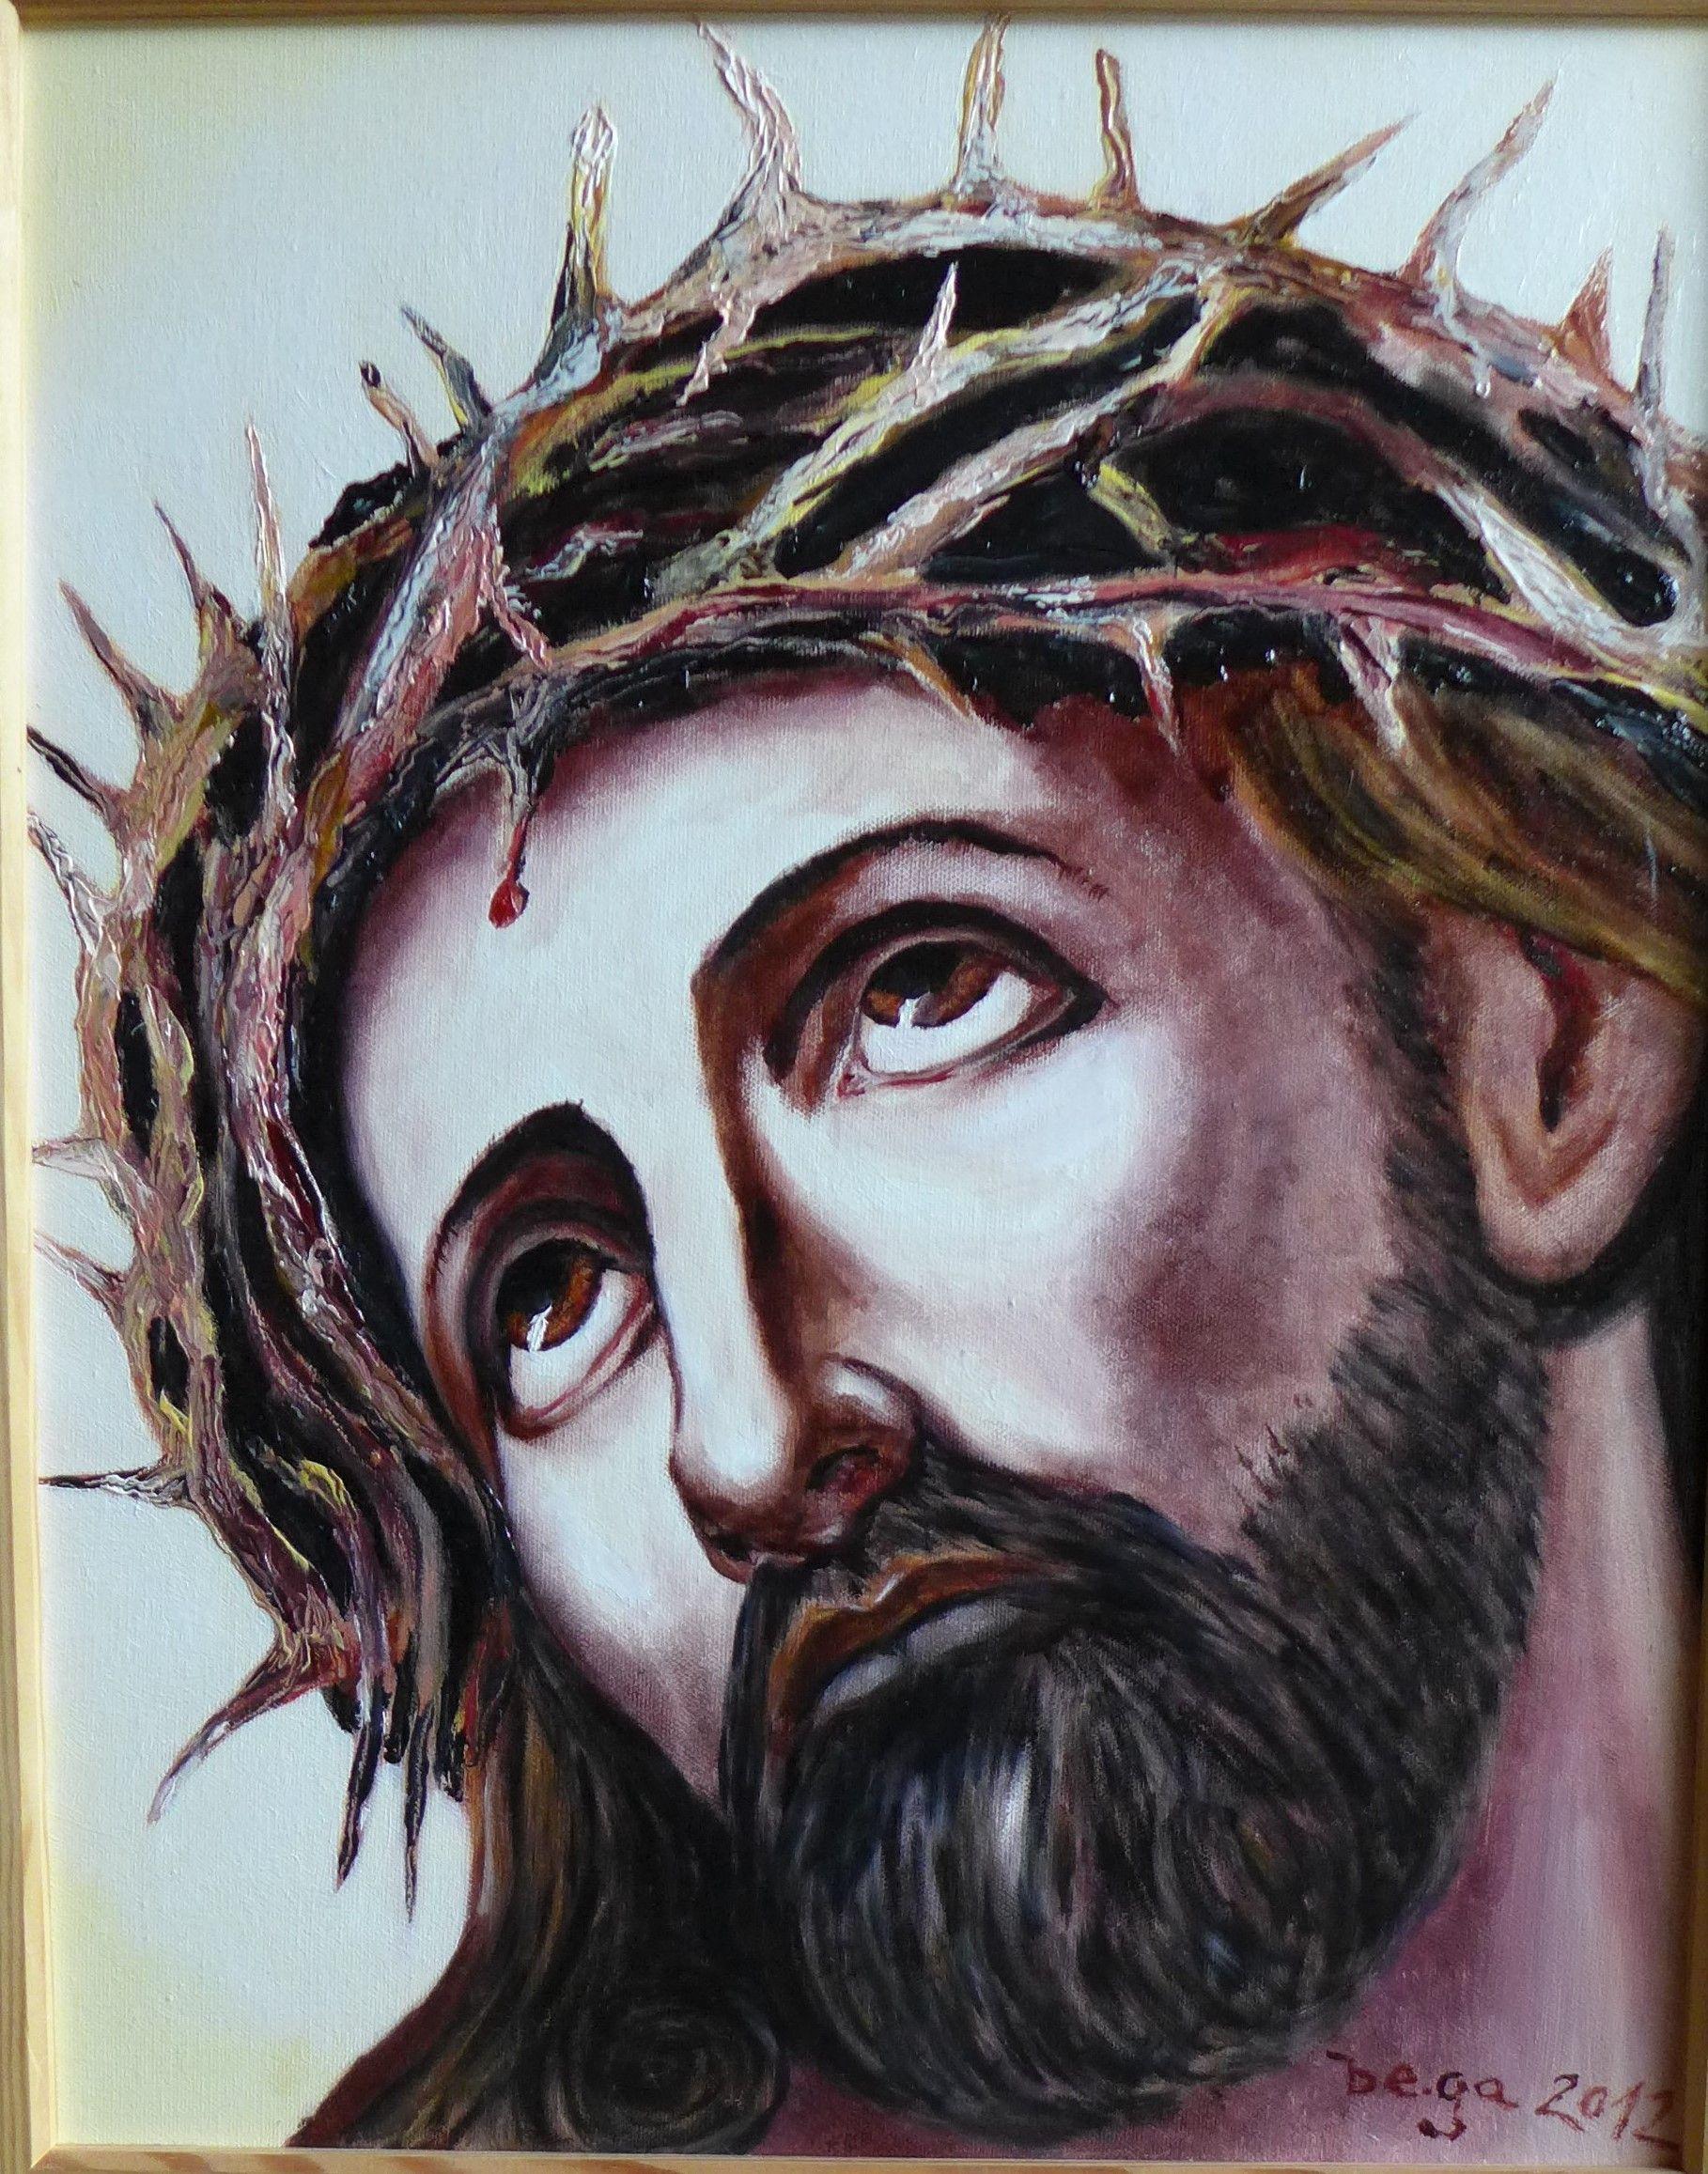 jesus mir dornenkrone bega 2012 ol auf leinwand 30x40 cm leinwanddruck günstig leinwände fotos